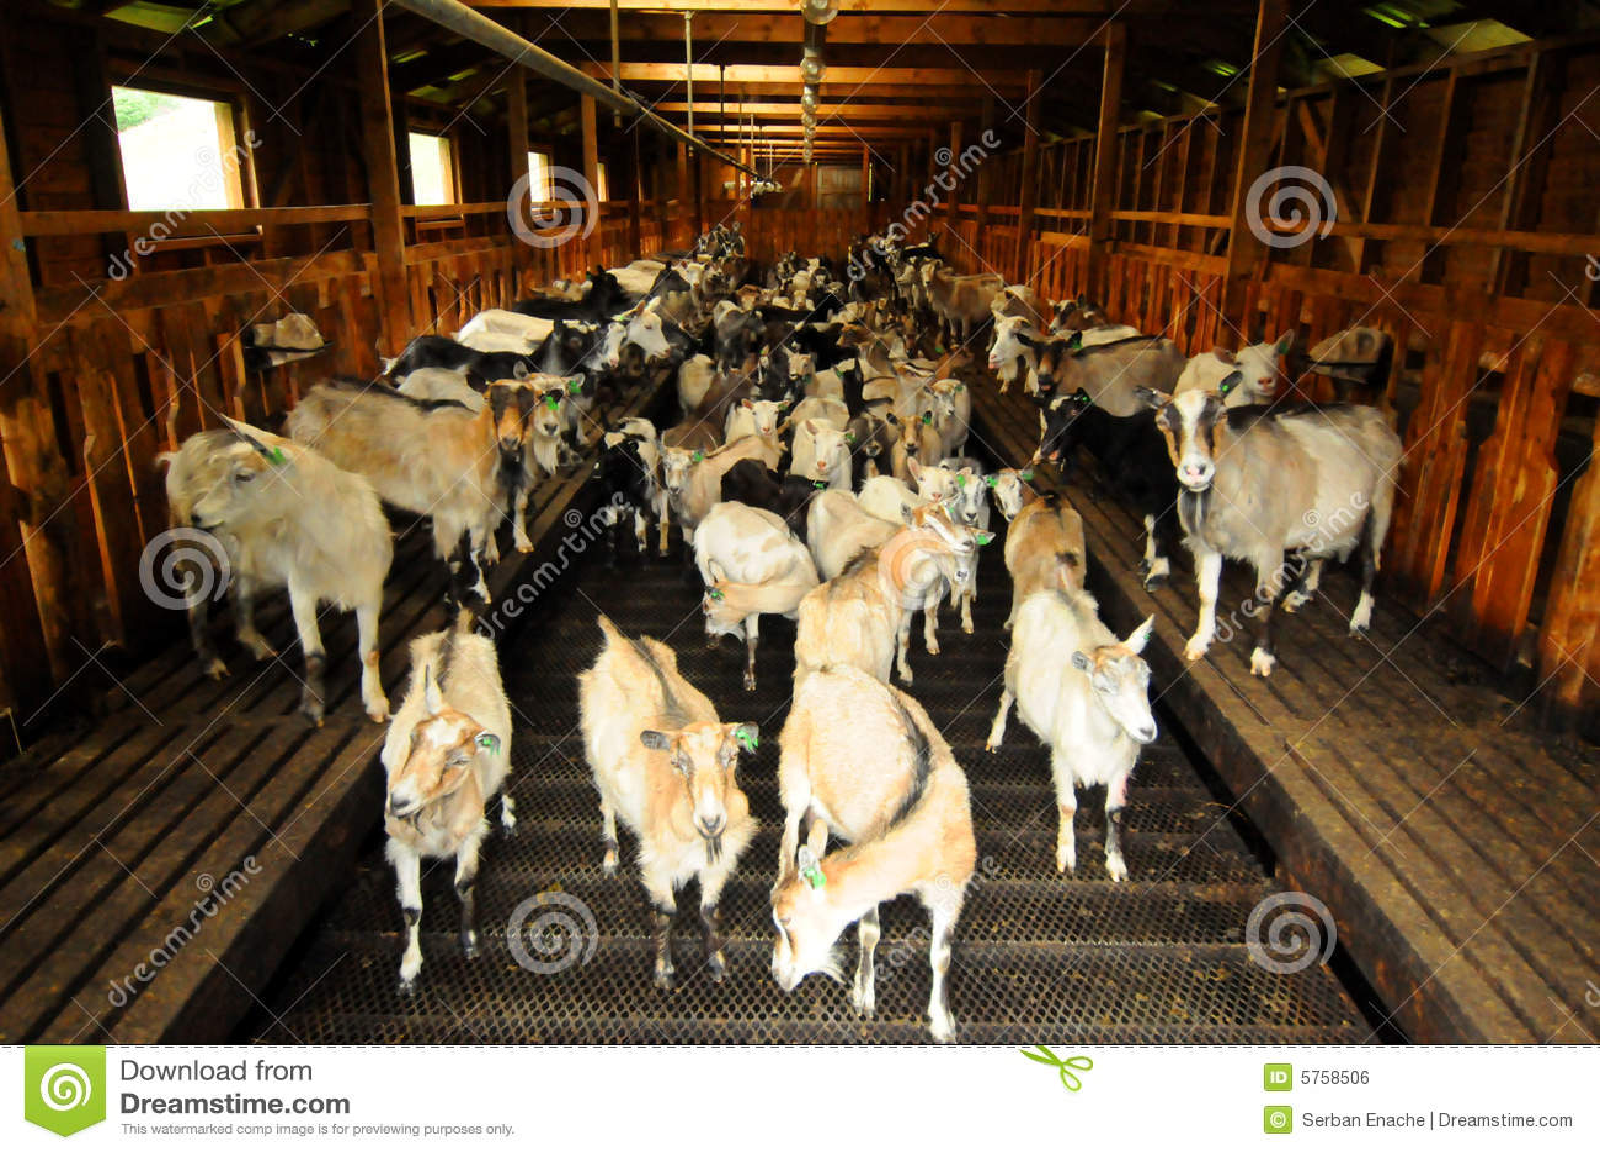 Goats at farm